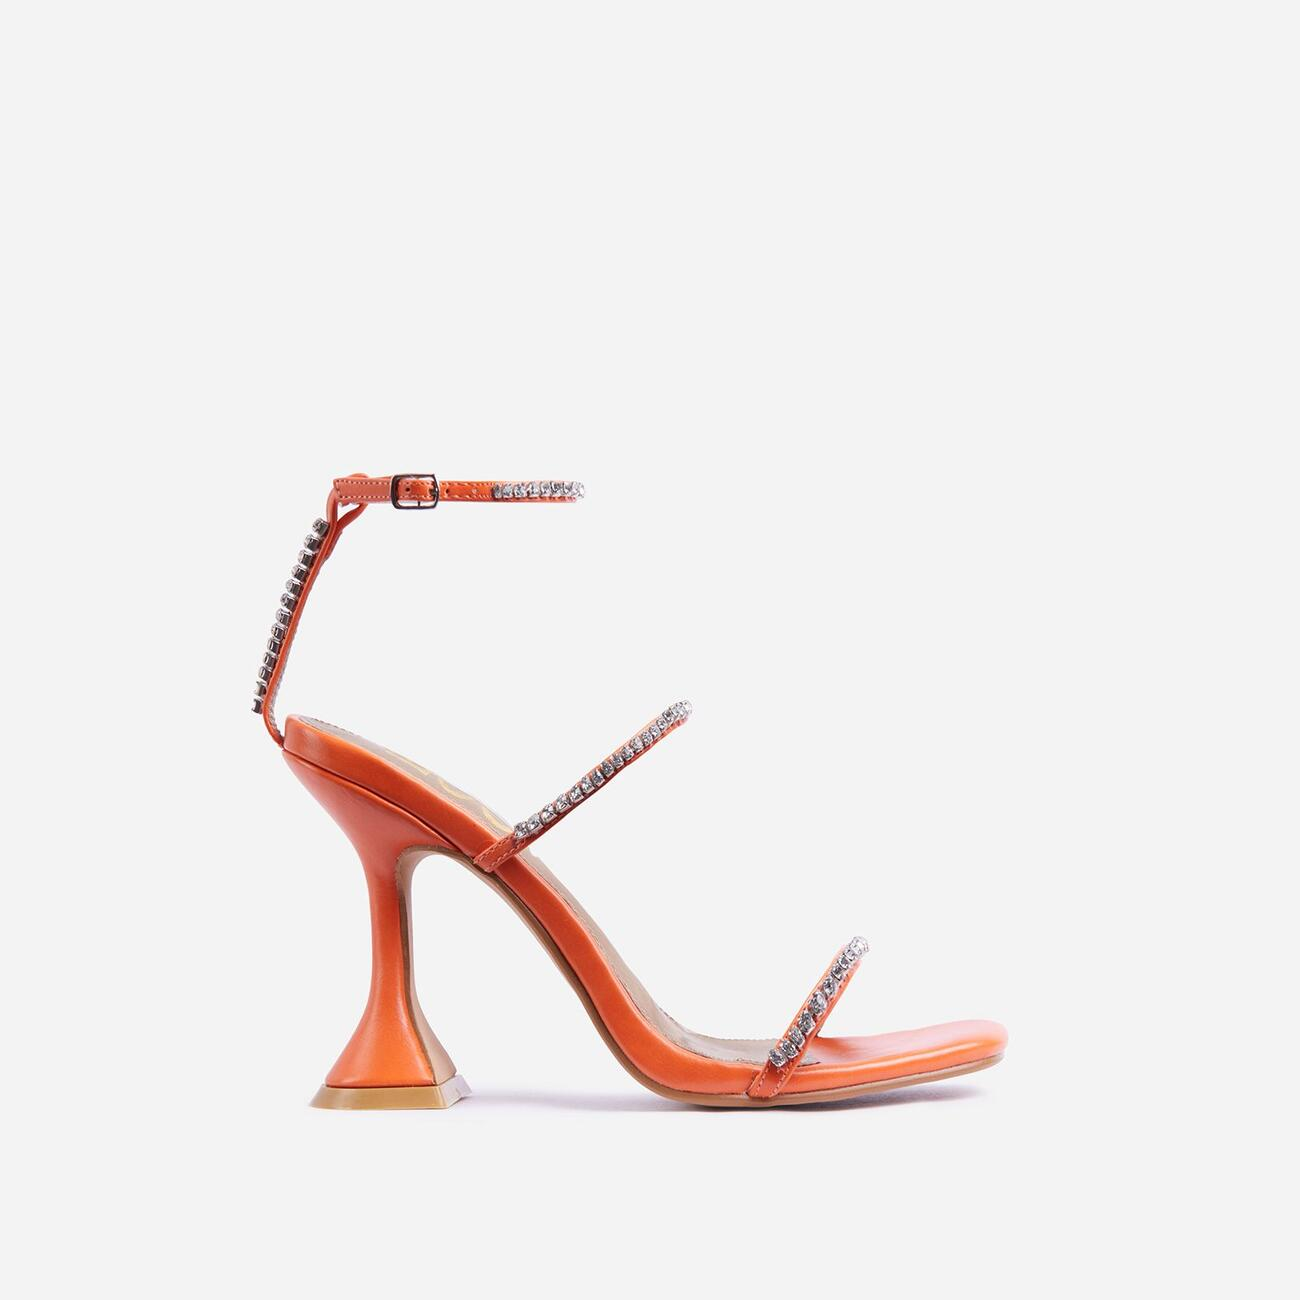 Catch Me Diamante Detail Square Toe Pyramid Heel In Orange Faux Leather Image 1